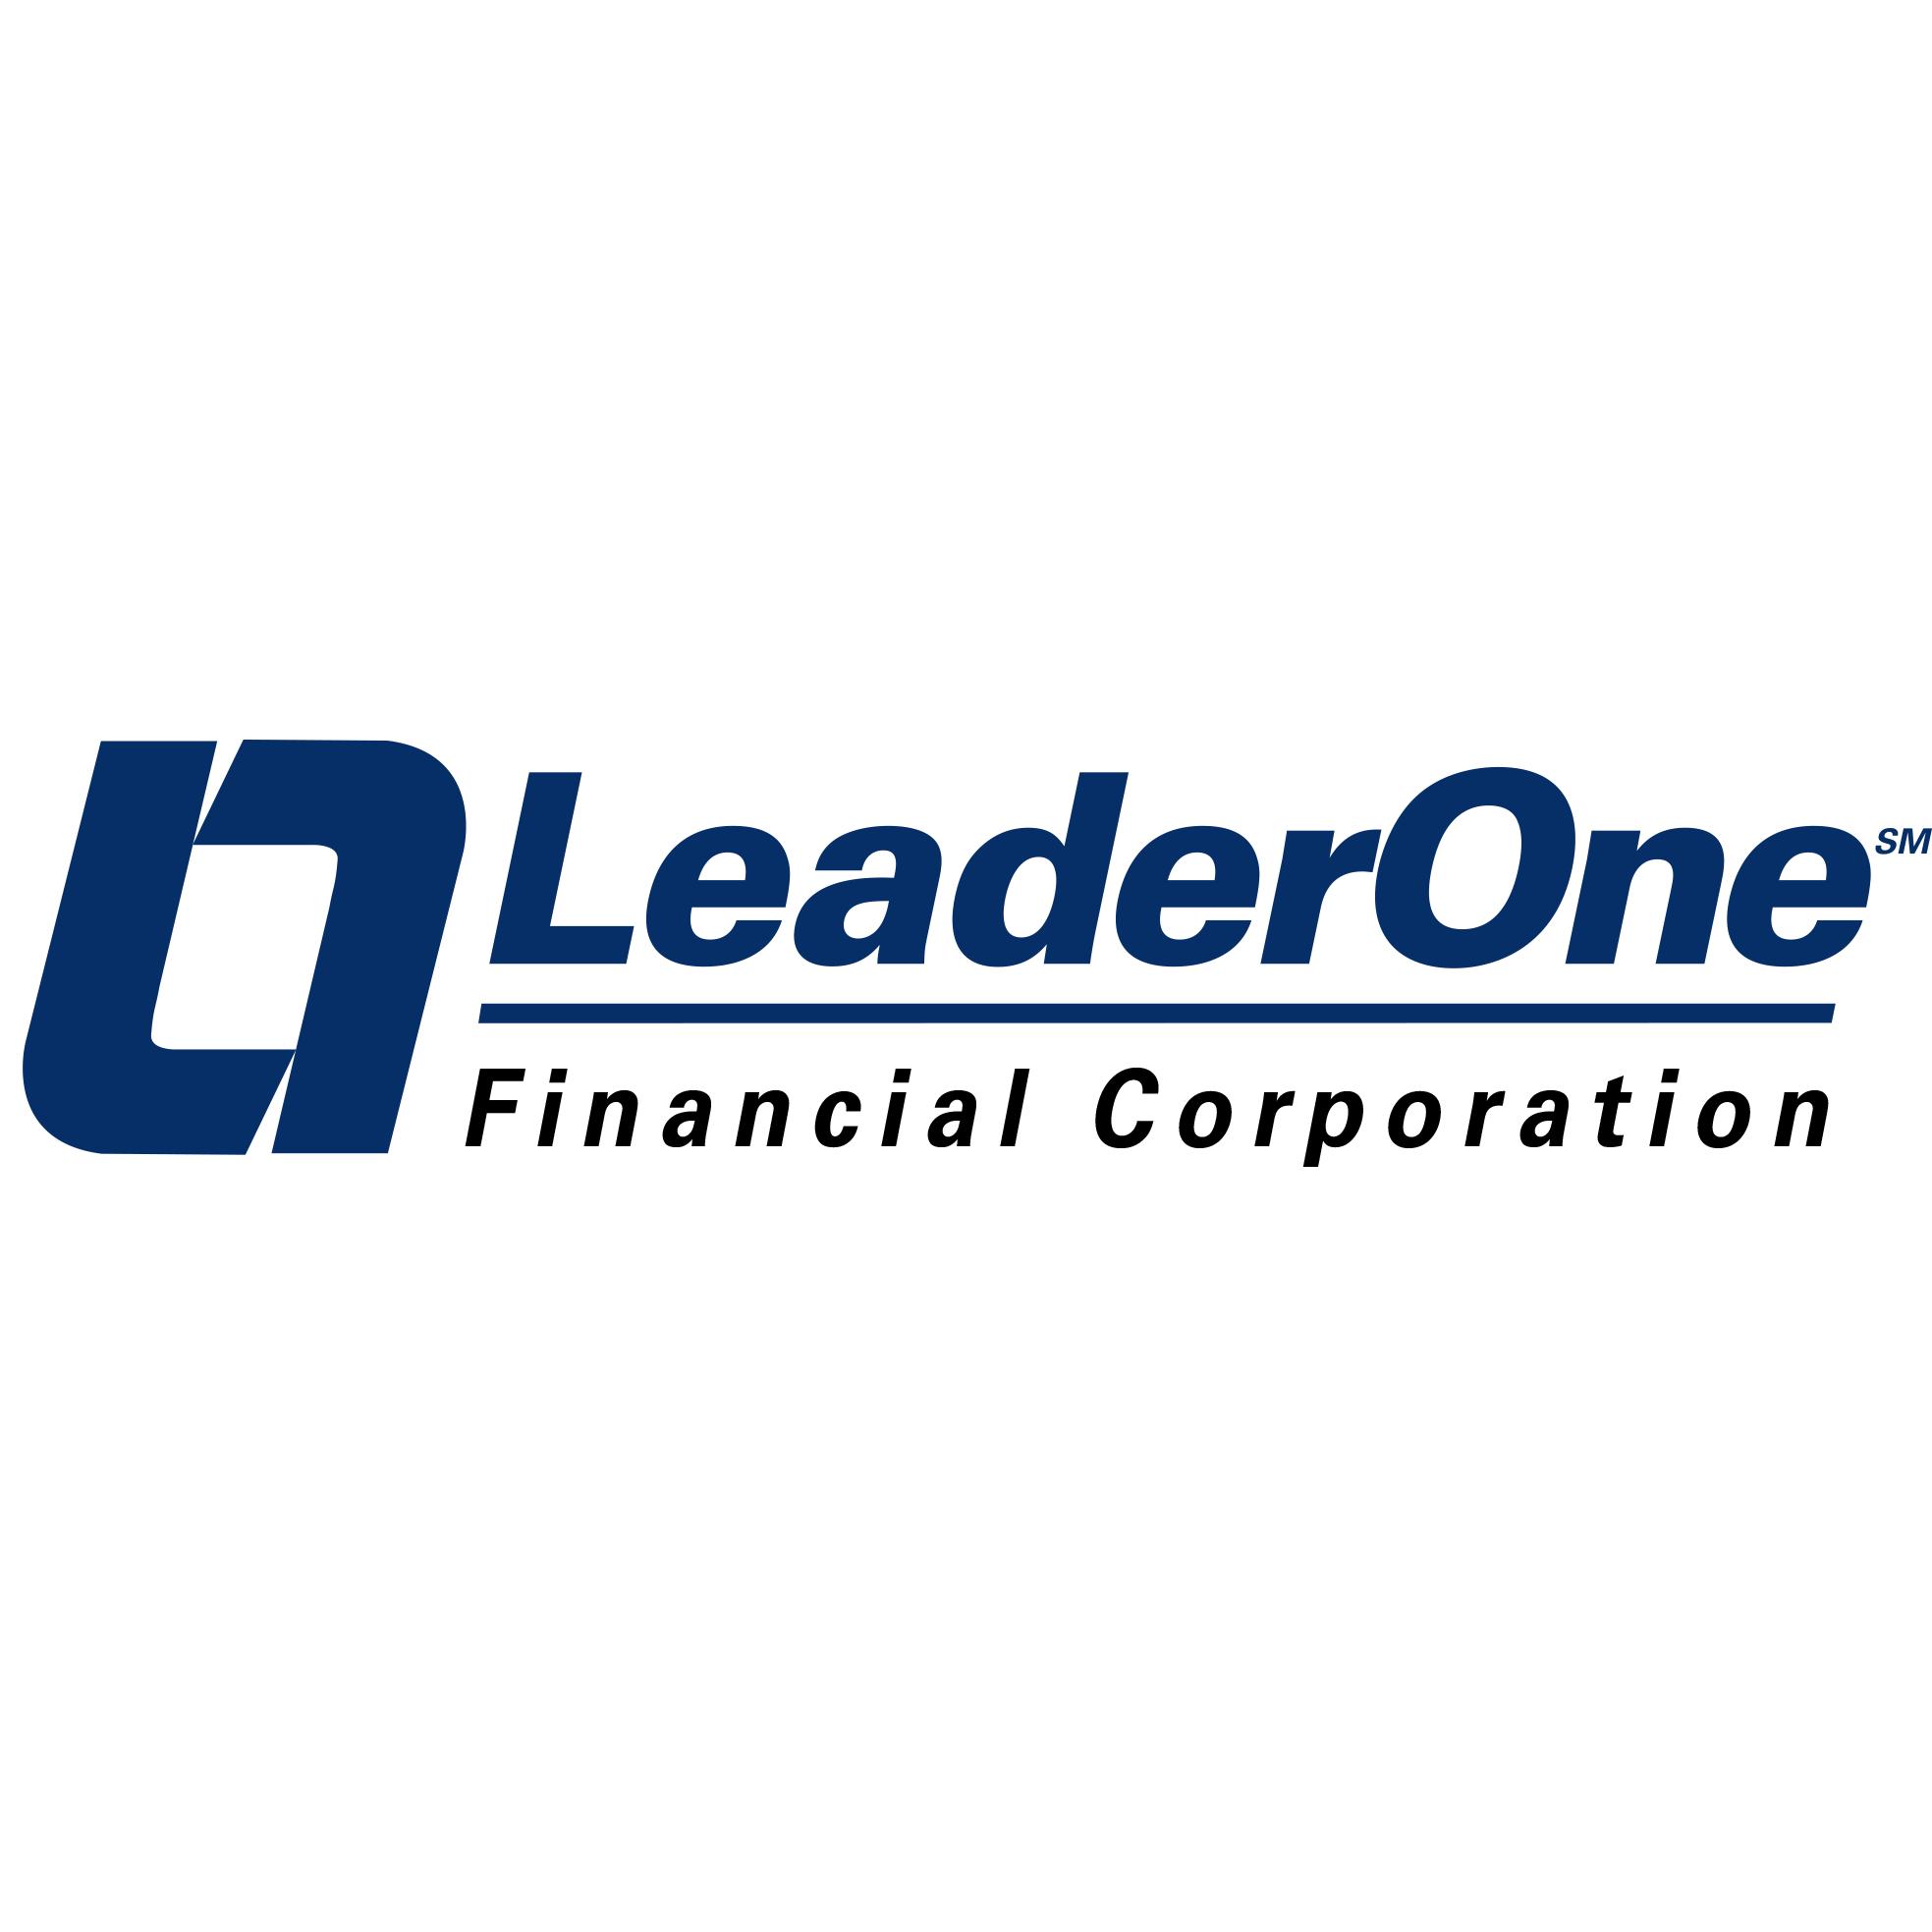 Jason Hill - Leaderone Financial Corporation